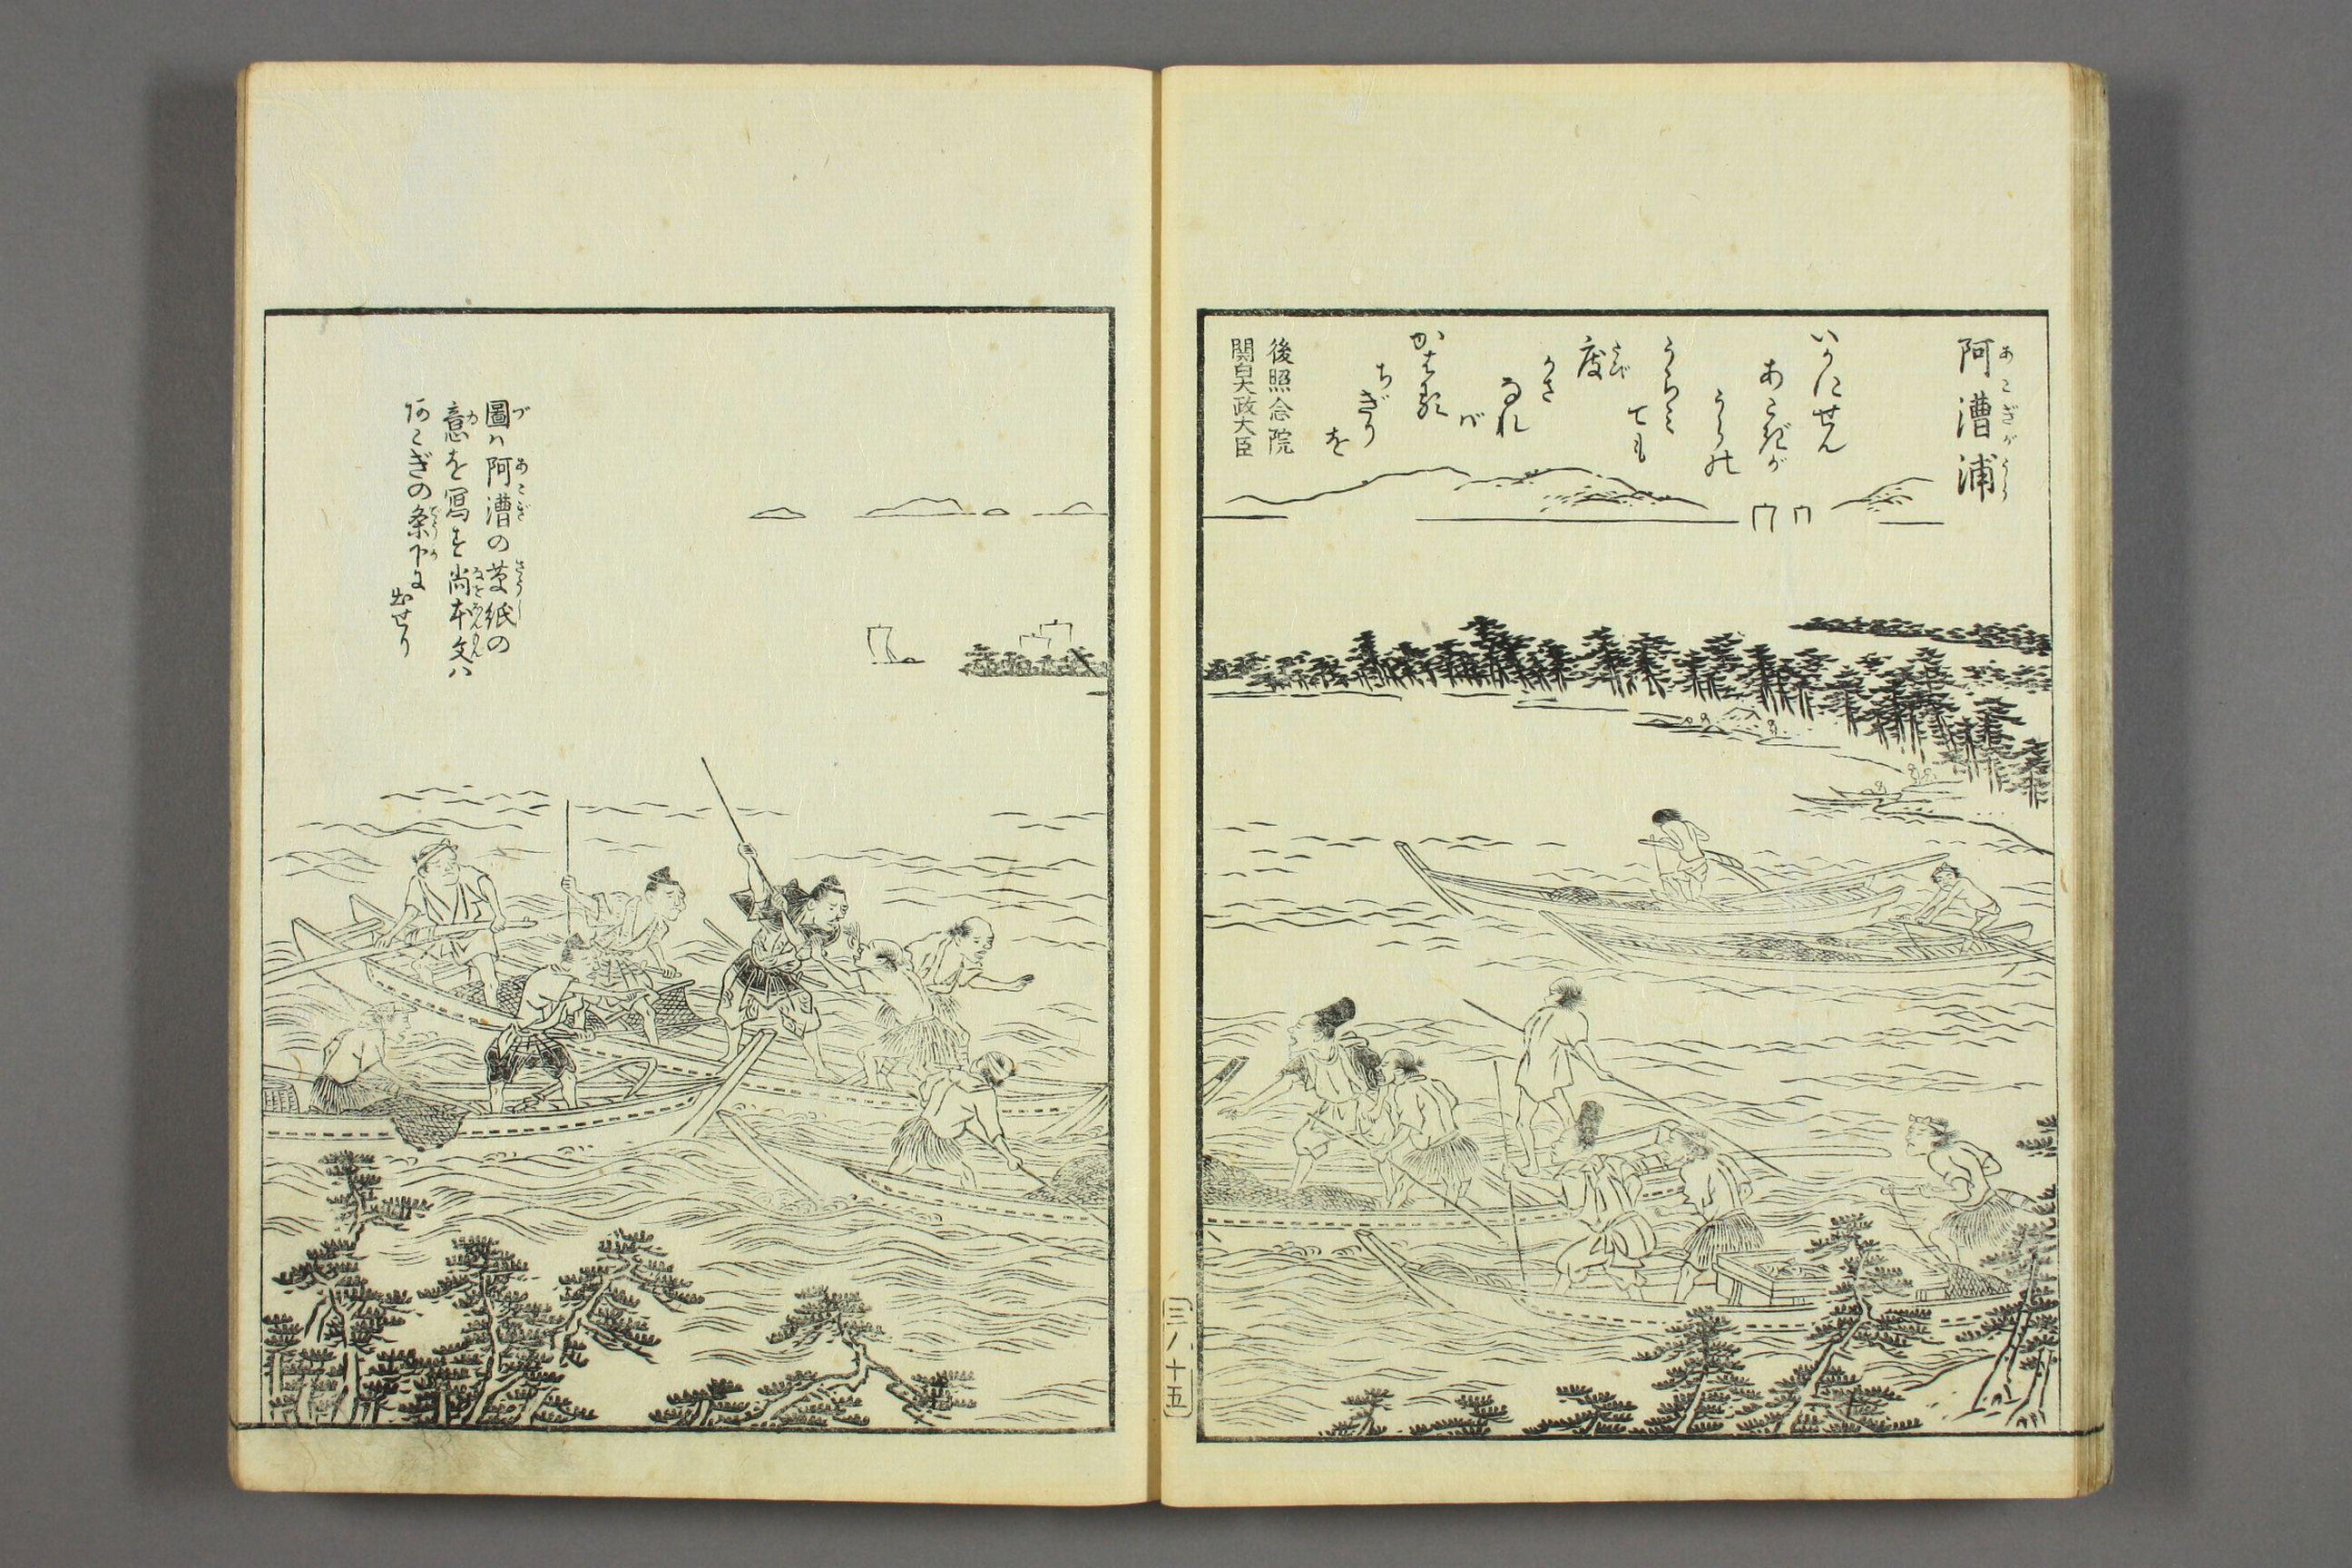 http://archive.wul.waseda.ac.jp/kosho/bunko30/bunko30_e0211/bunko30_e0211_0003/bunko30_e0211_0003_p0018.jpg